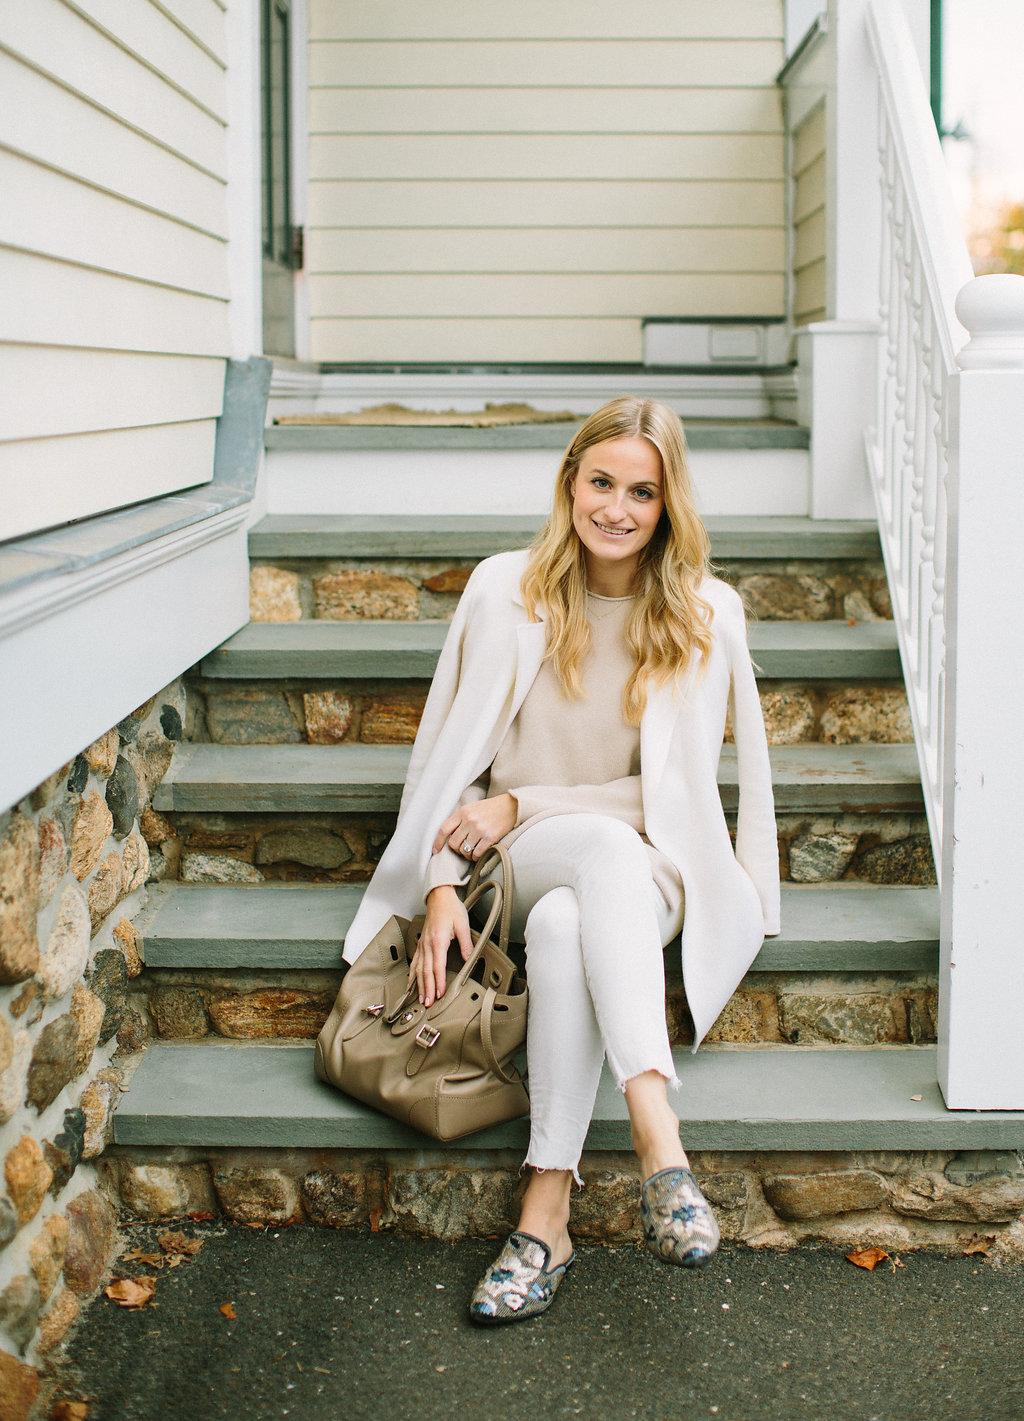 TheGirlGuide-StephanieTrotta-LindsayMaddenPhotography-10.jpg